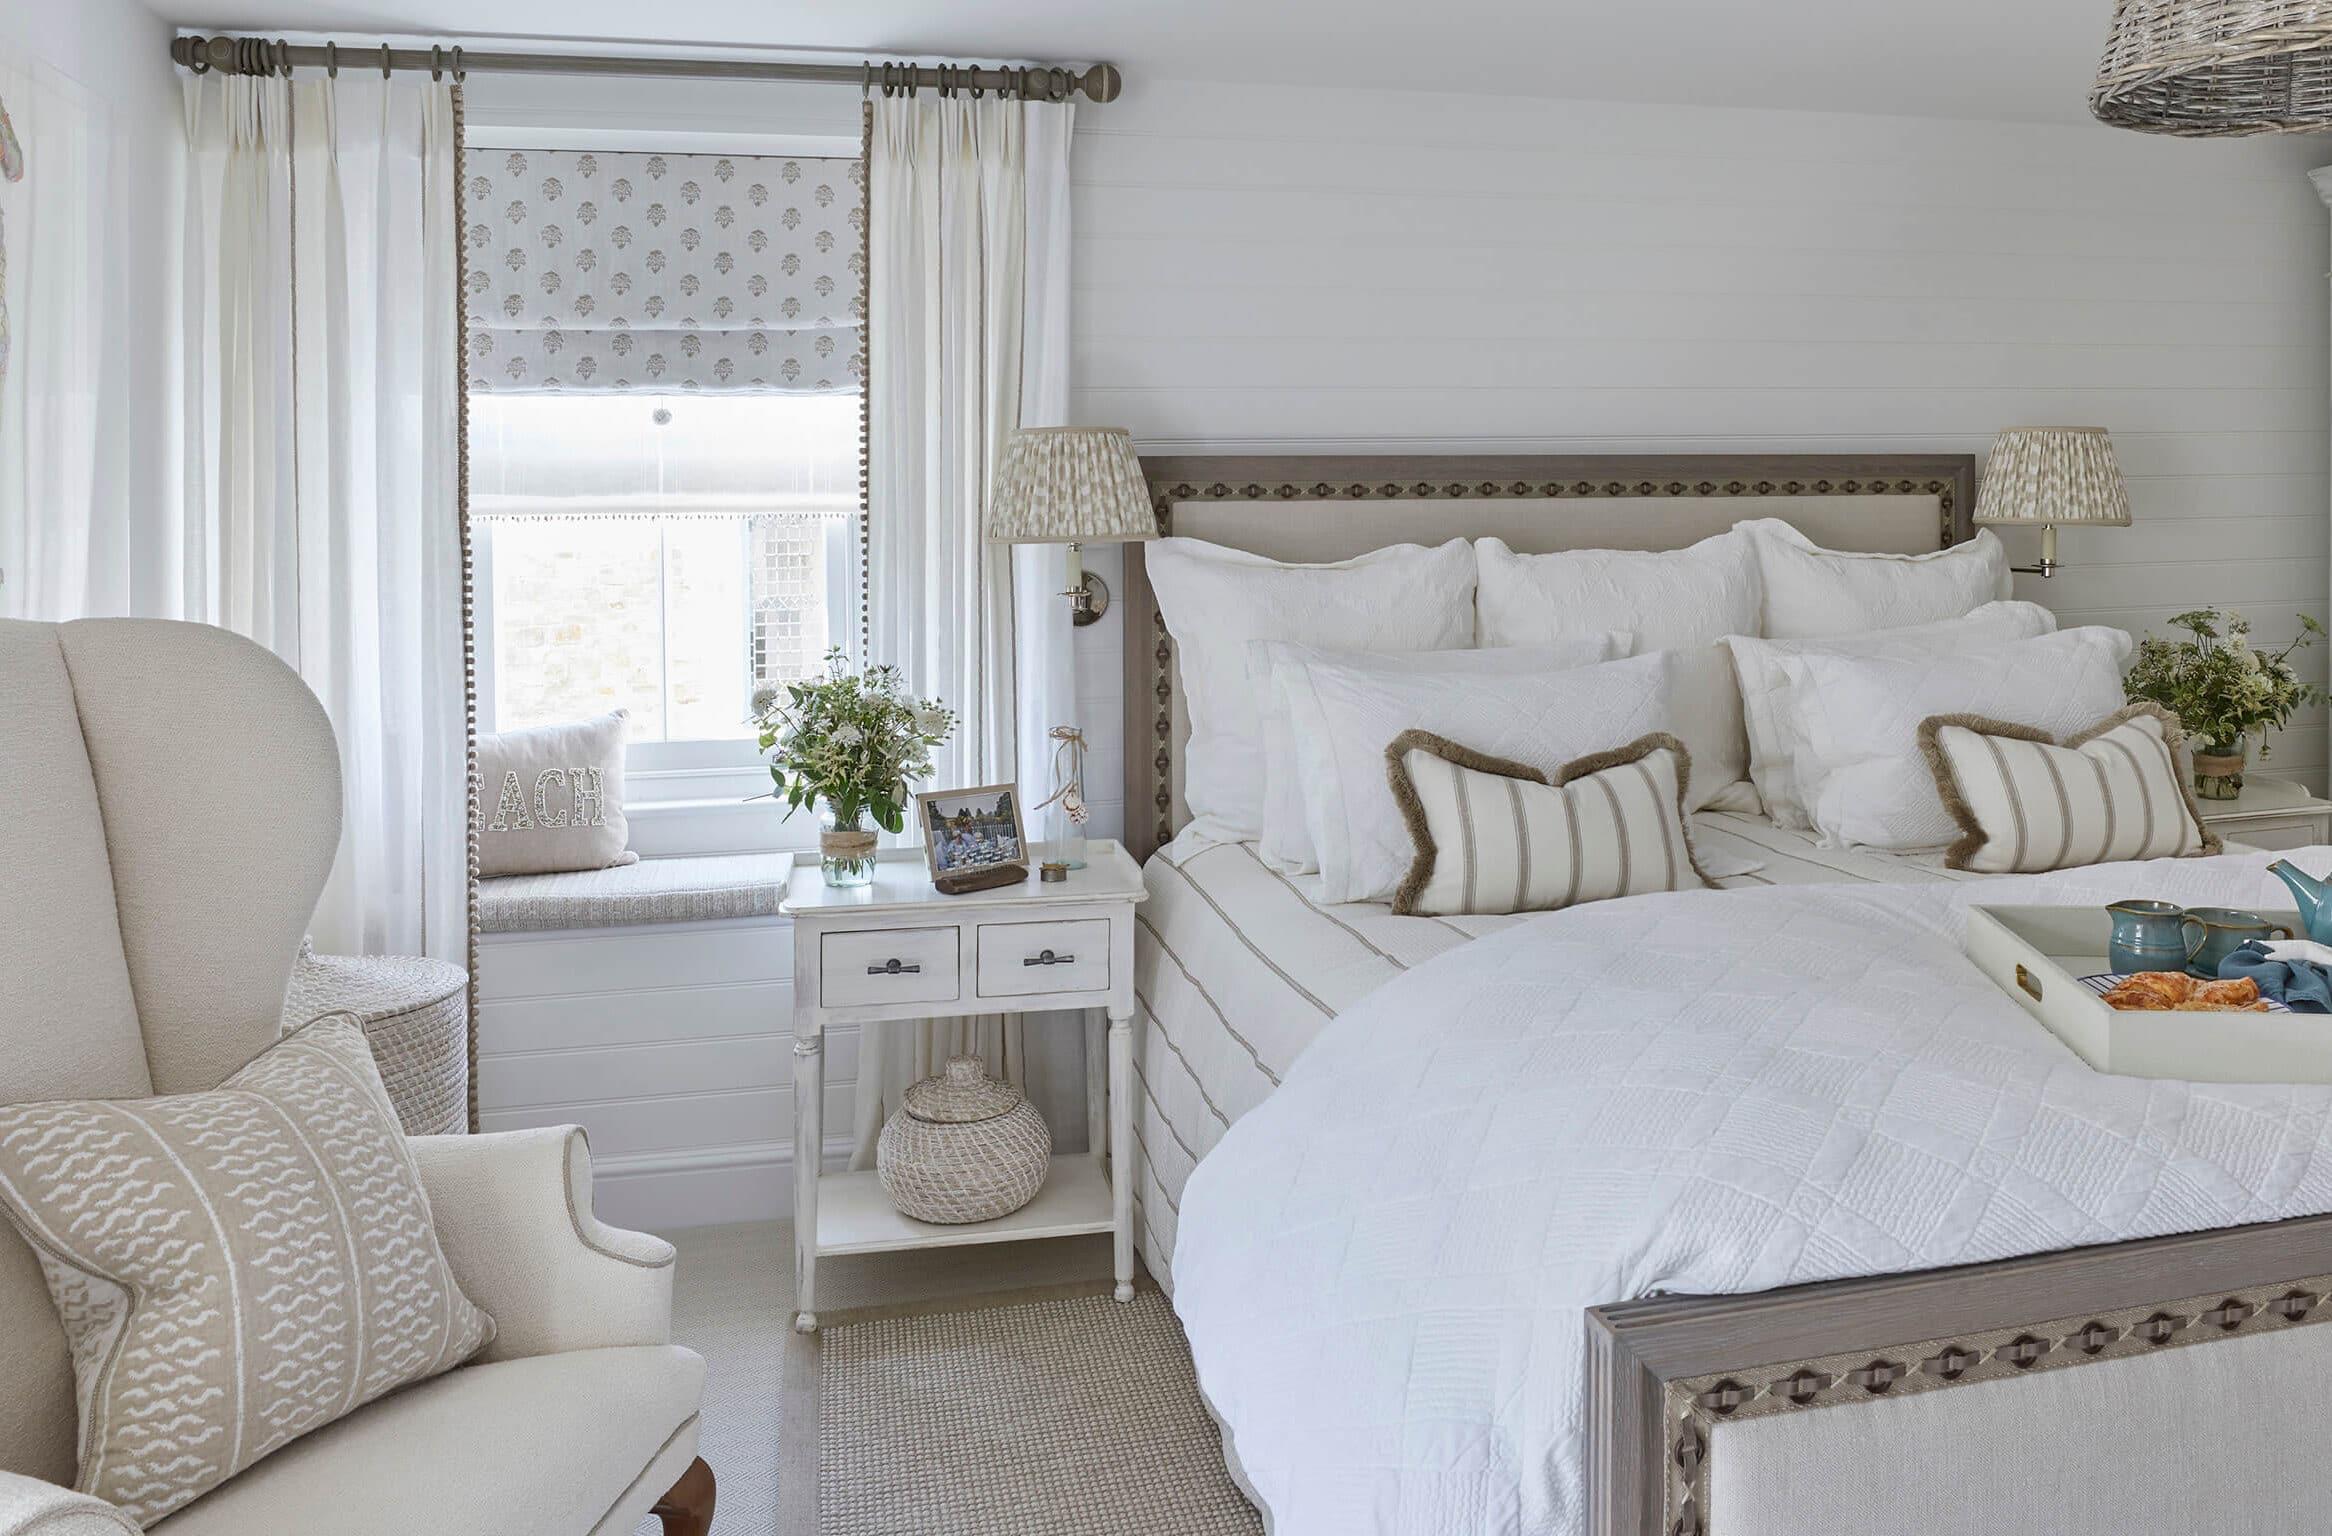 Bedroom of luxury beachhouse in Devon